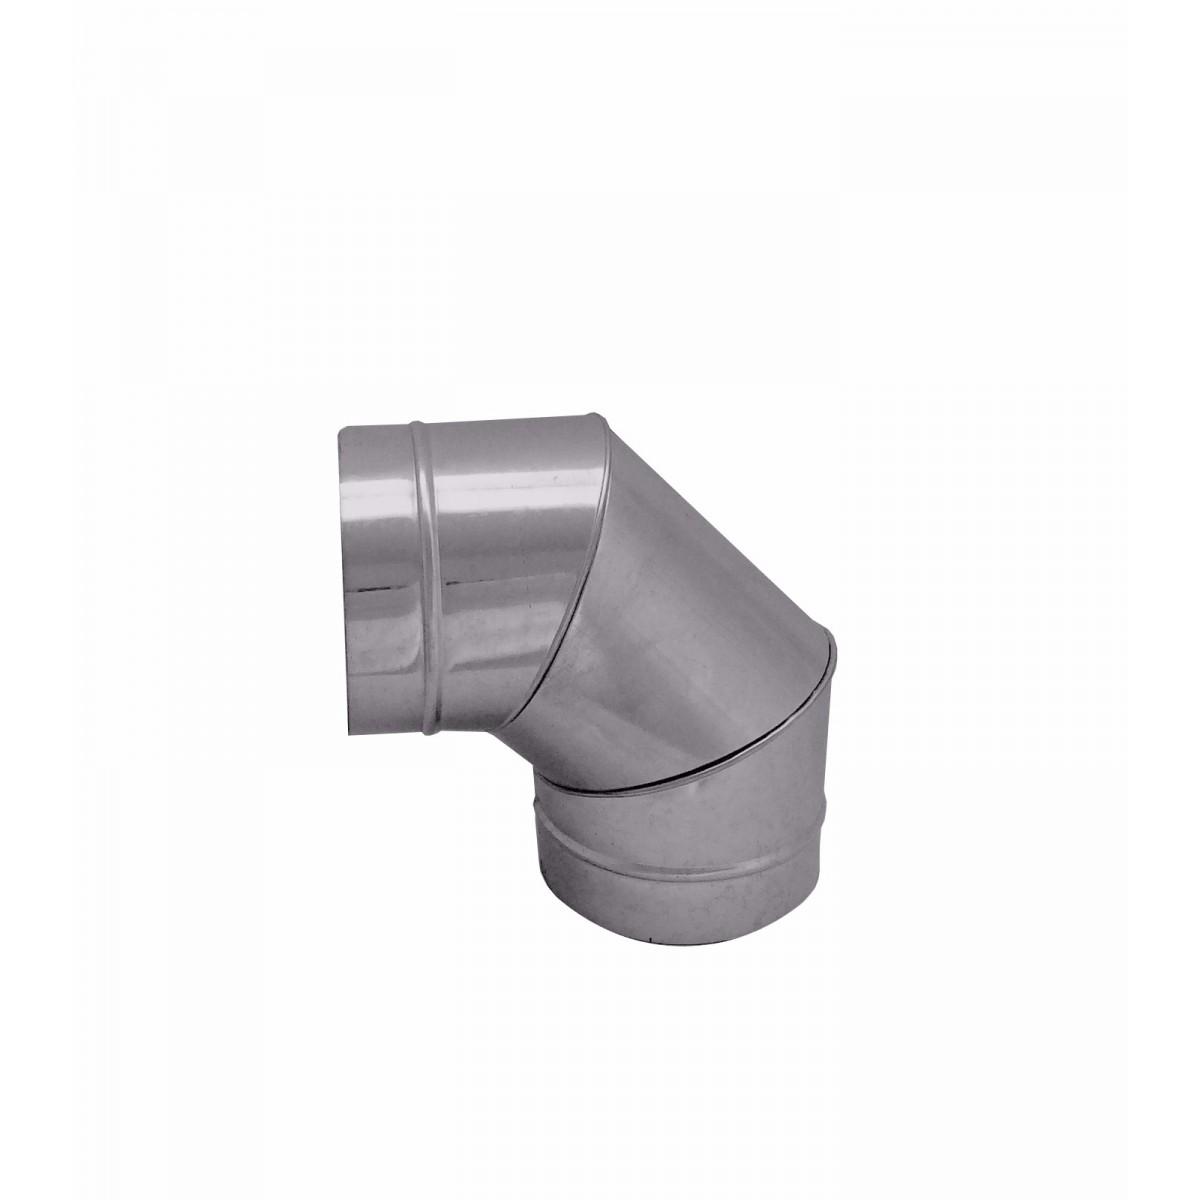 Curva / cotovelo galvanizada 90° de 130 mm de diâmetro  - Galvocalhas